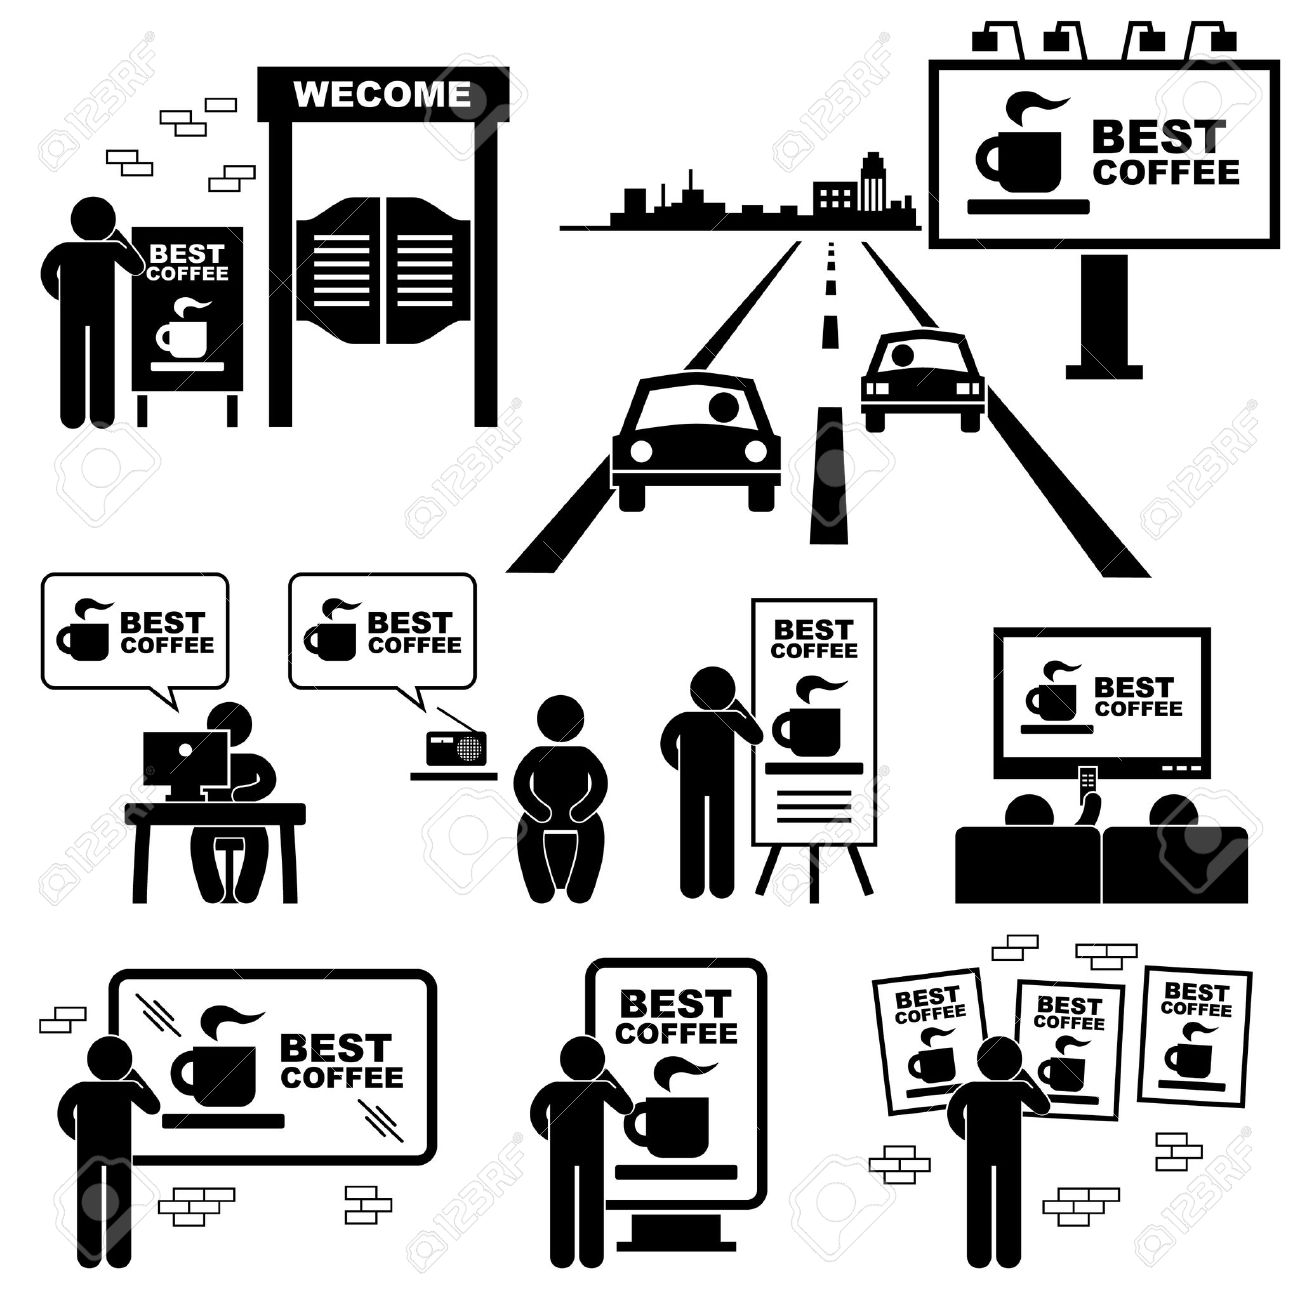 Advertisement Board Billboard Marketing Frame Stick Figure Pictogram Icon Stock Vector - 20283656